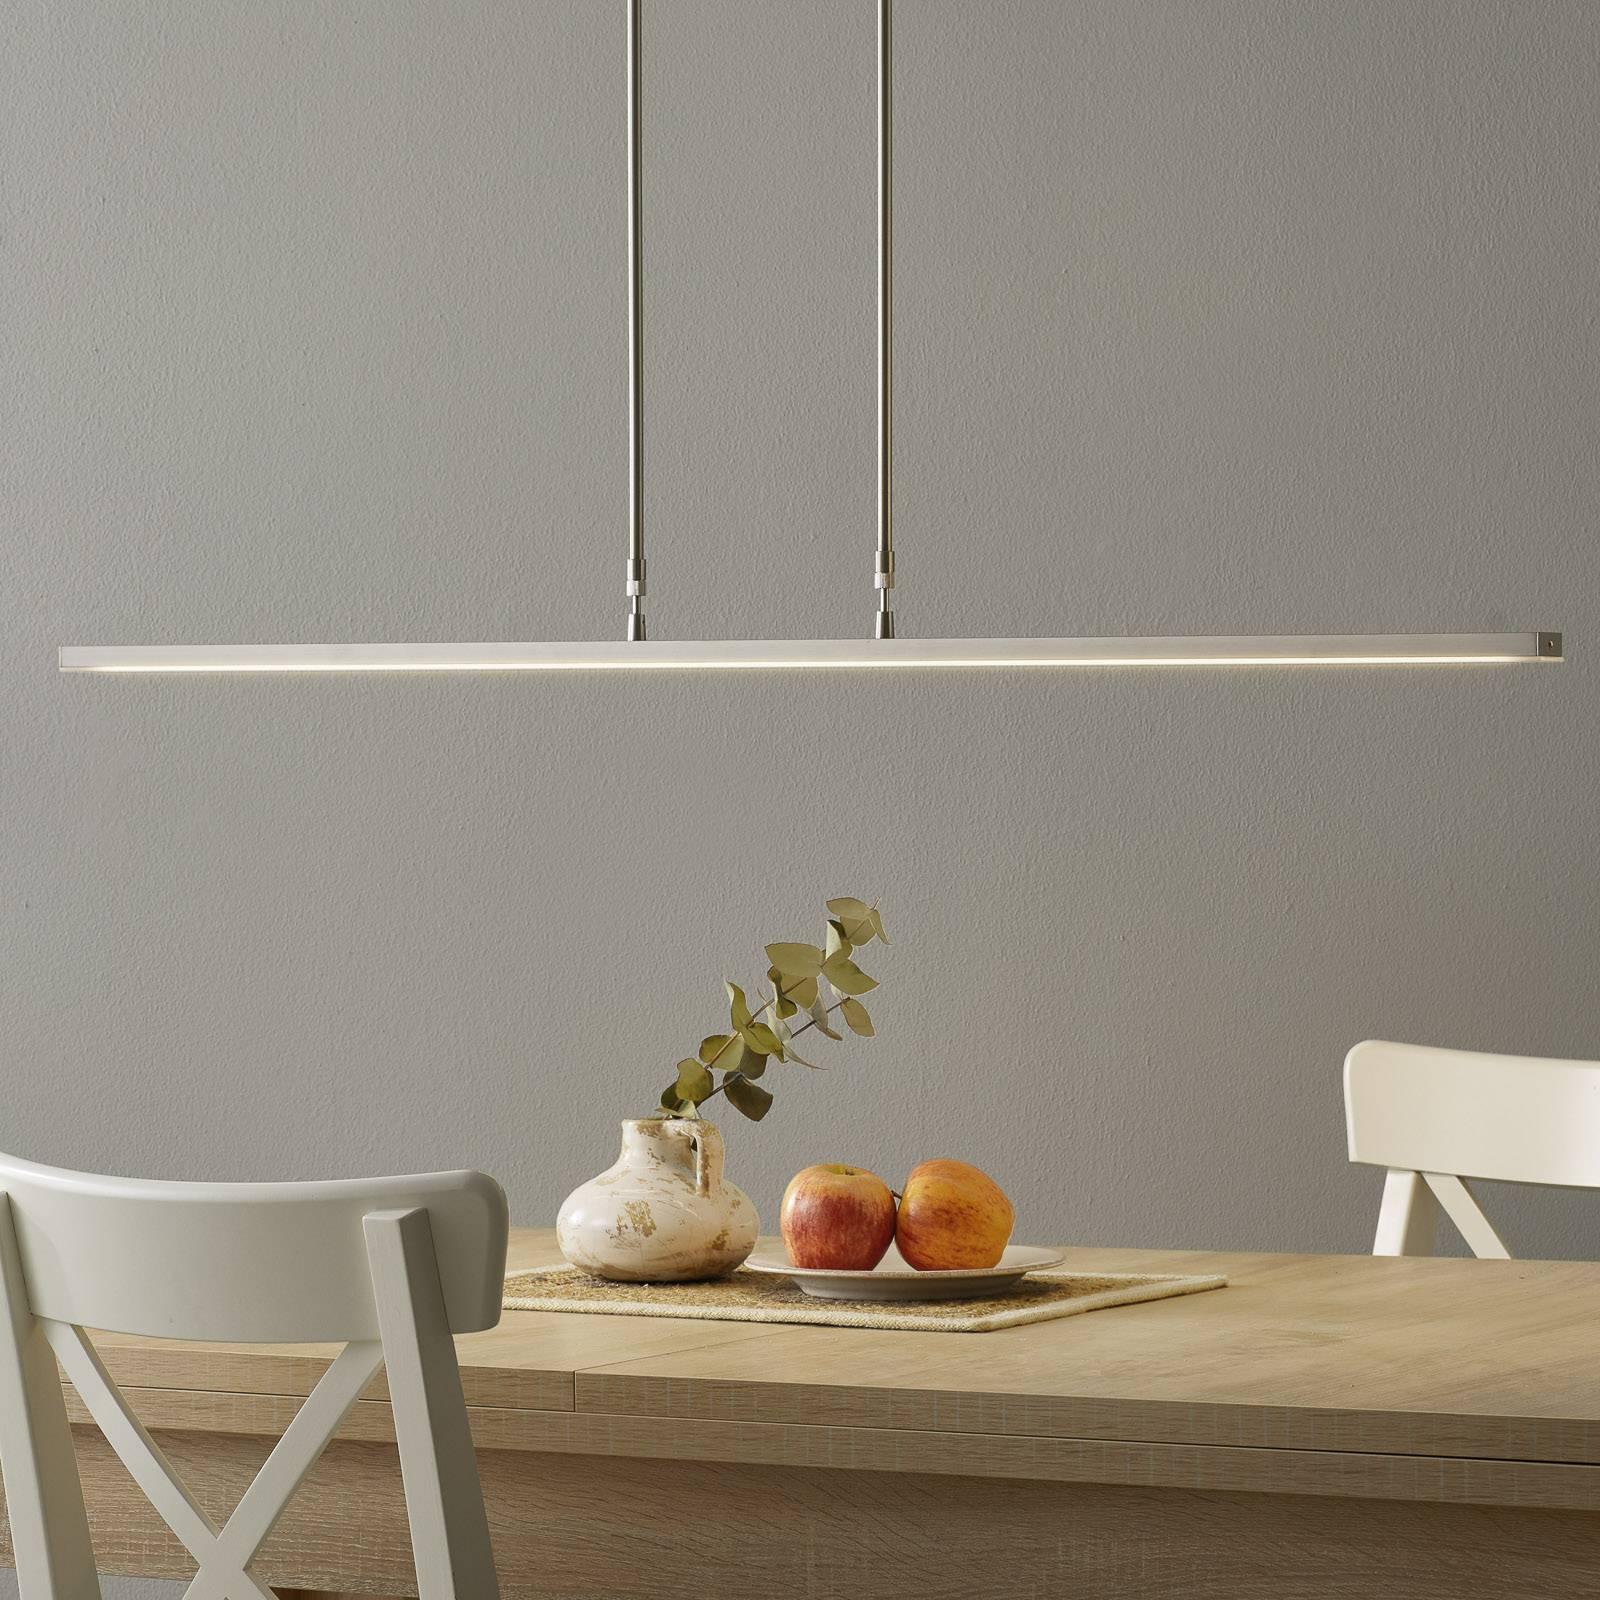 LED-riippuvalaisin Zelena Dim to Warm -toiminnolla